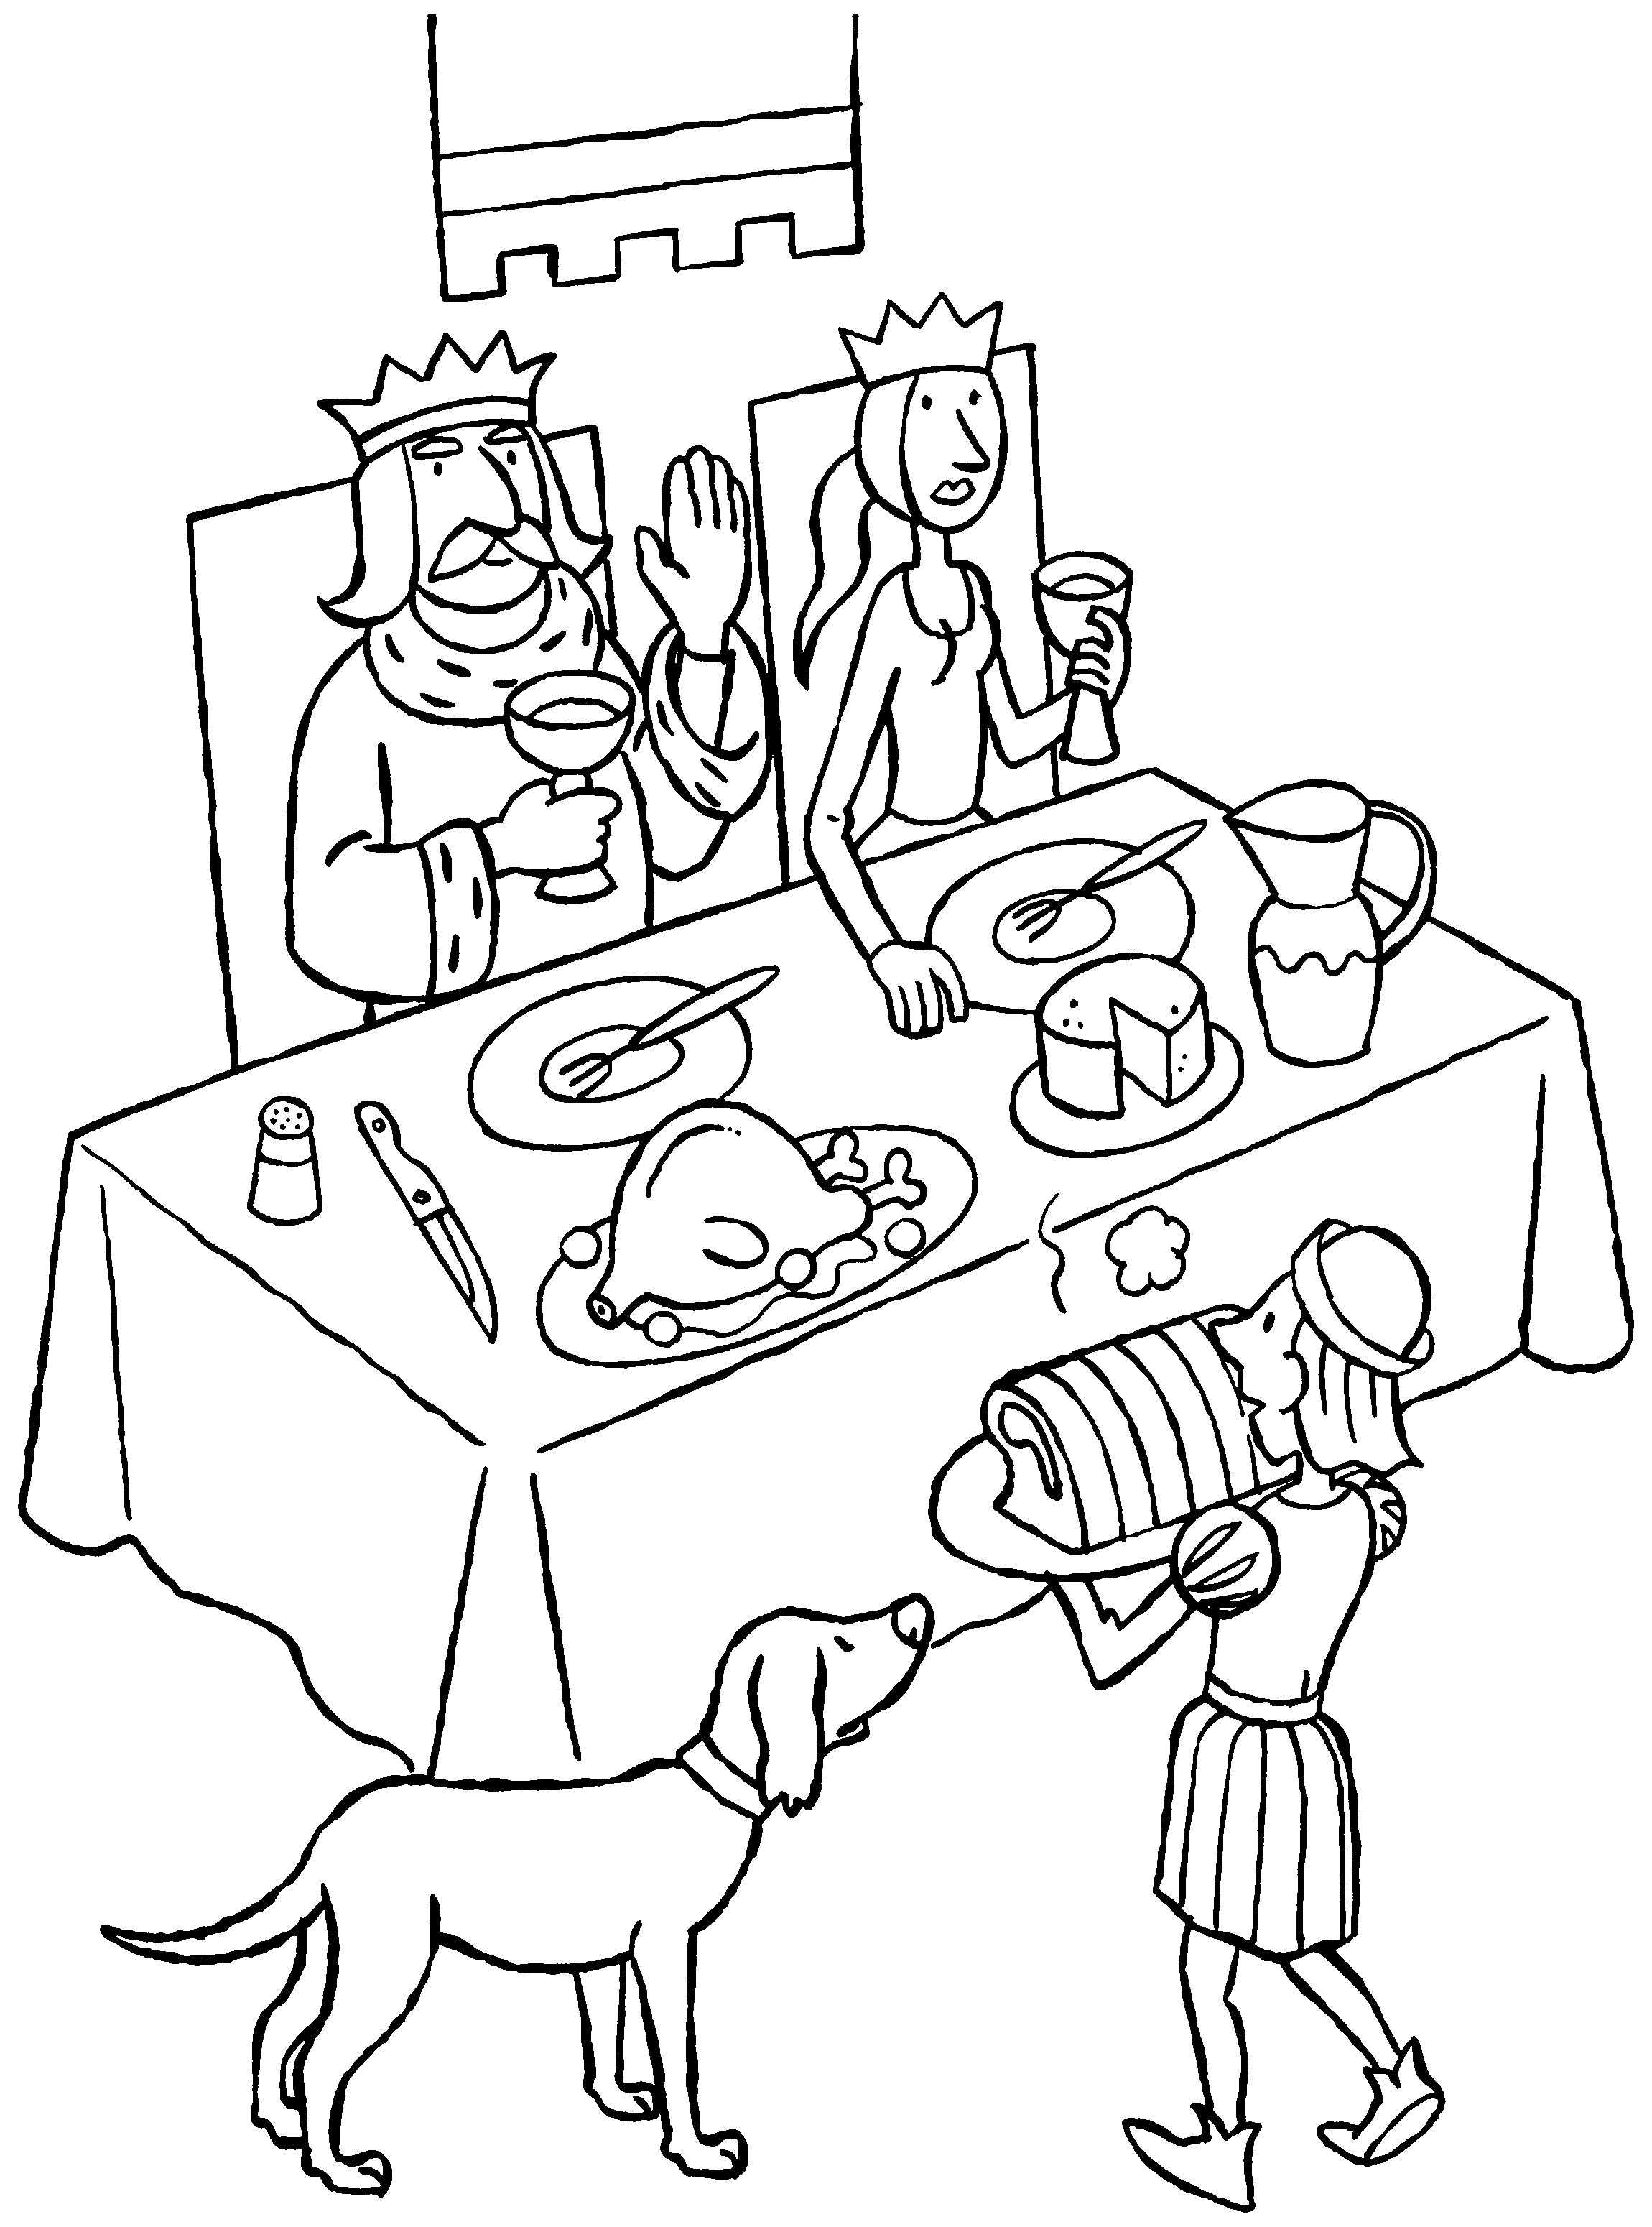 de koning en koningin dineren ridders kleurplaten koning